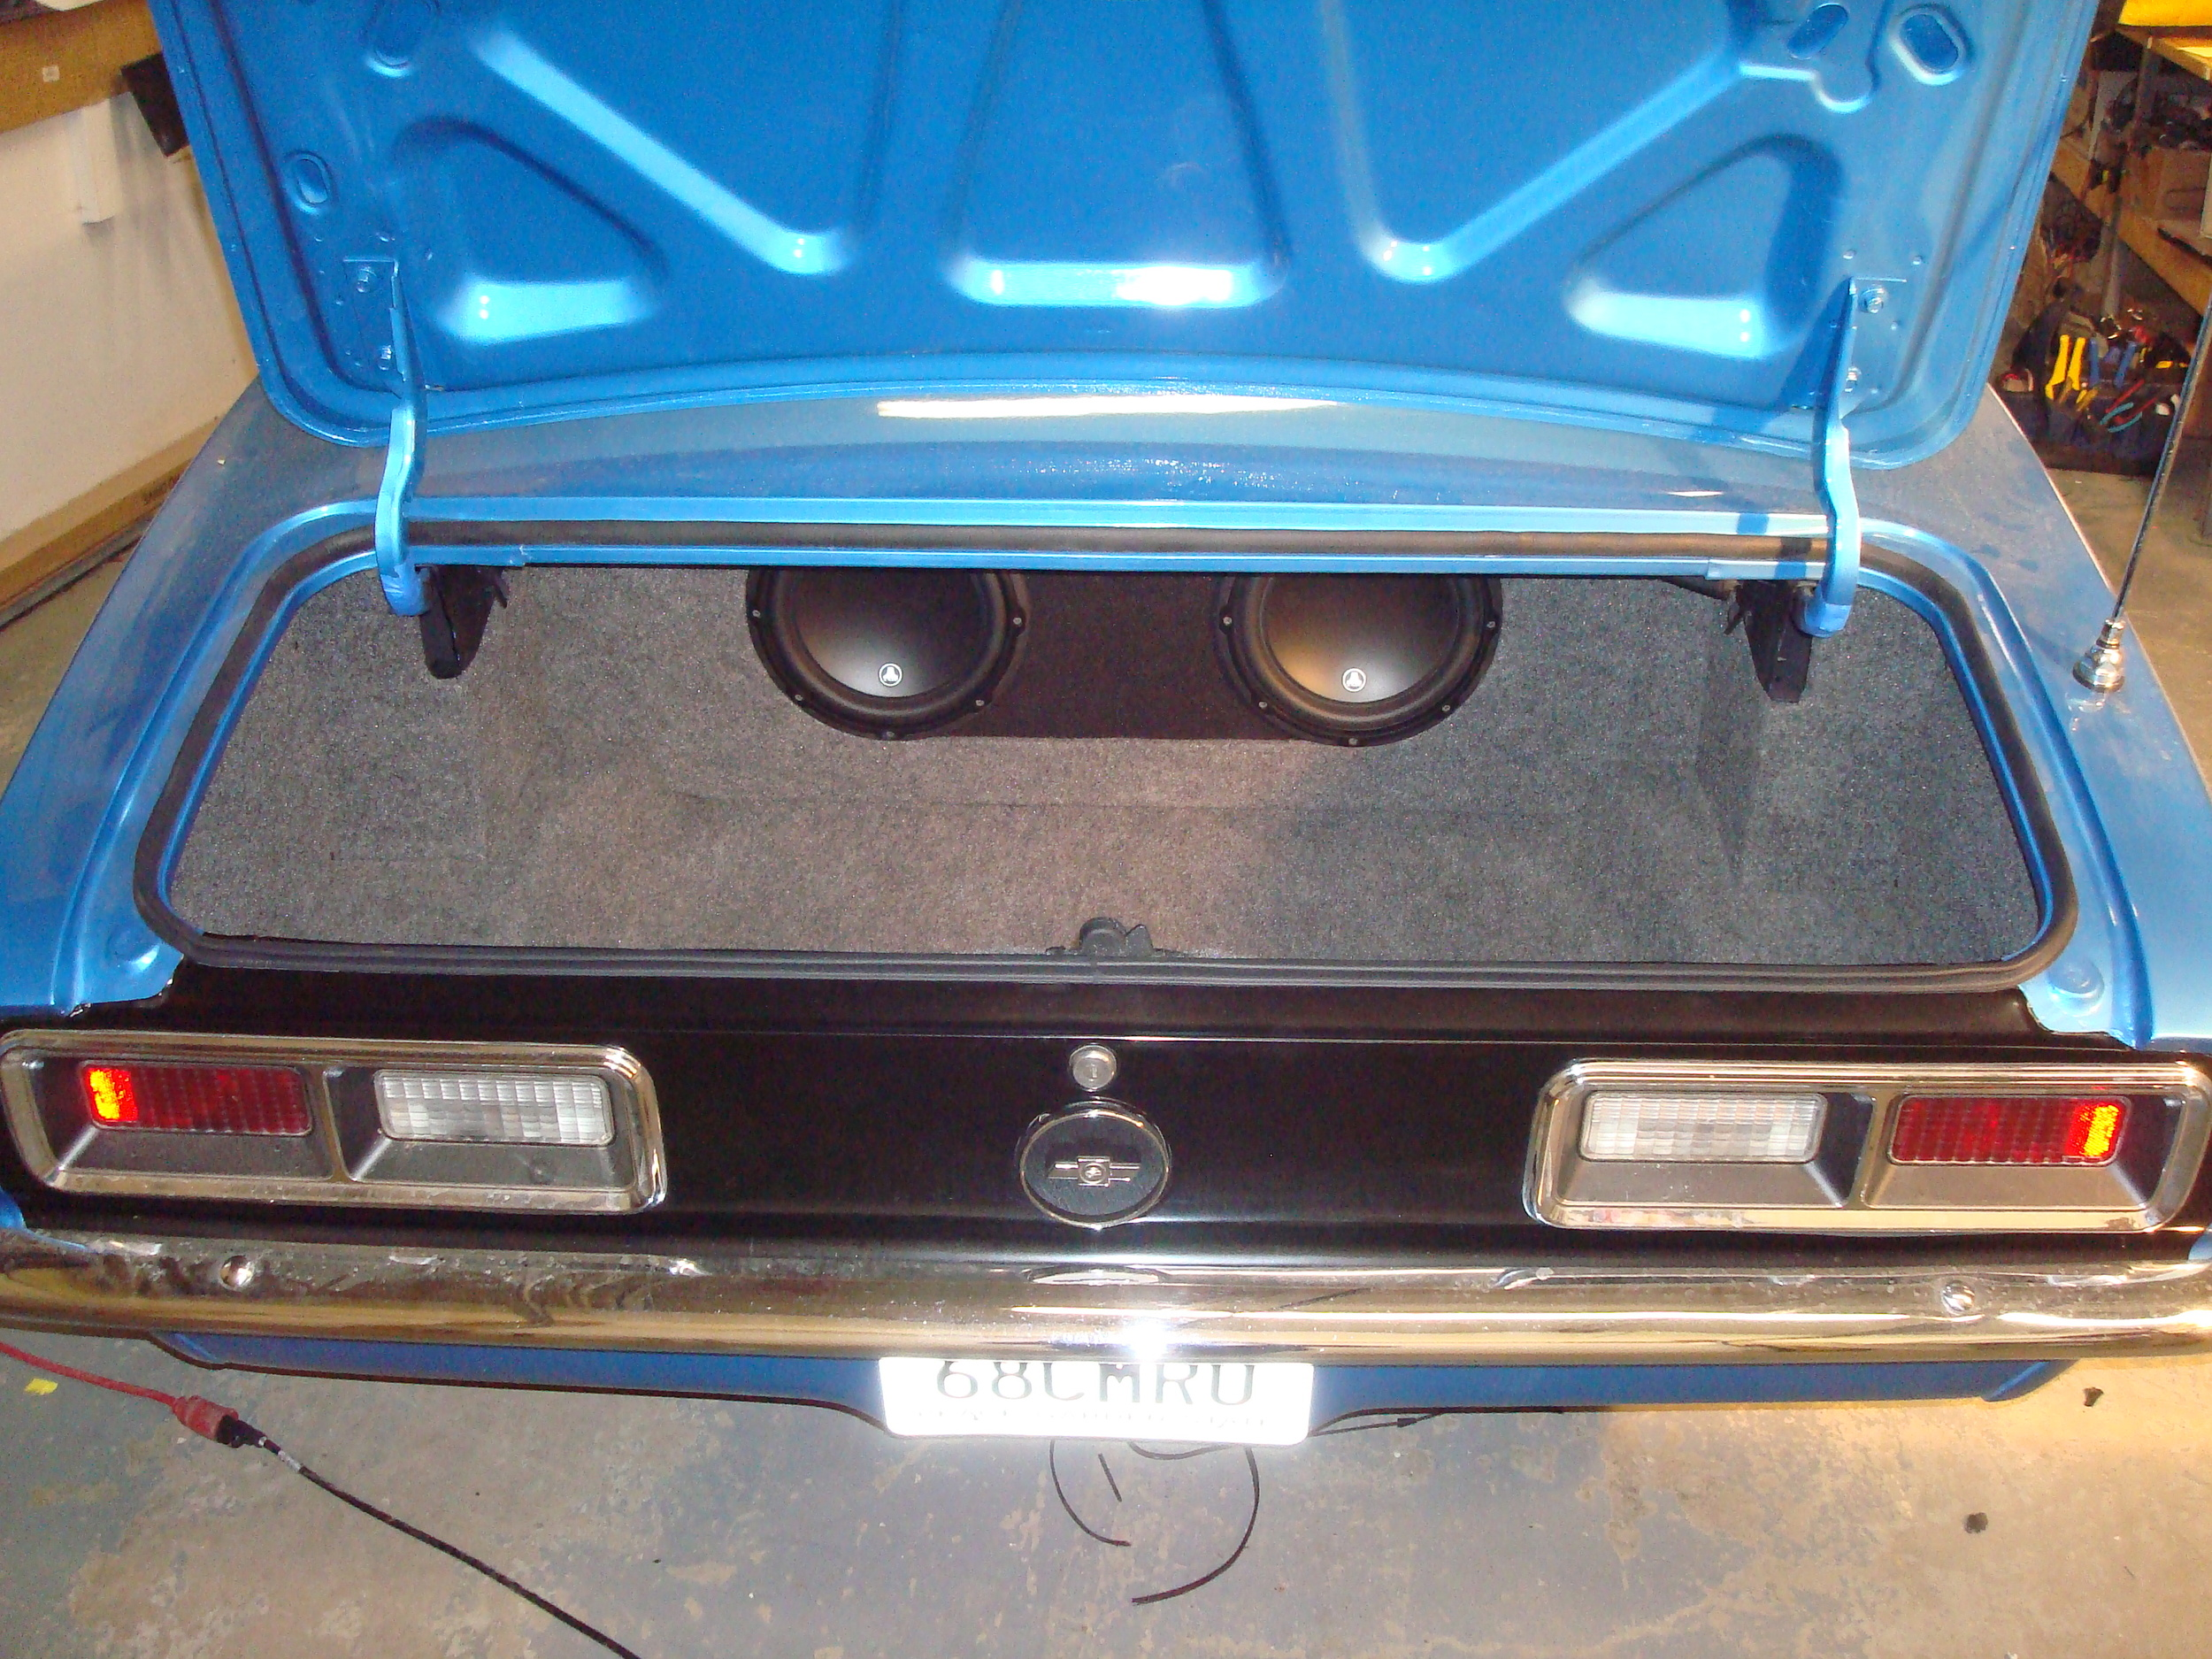 1968 Camaro - Custom Subwoofer Enclosure for (2) JL Audio 10W3v3 Subwoofers & Trunk Finishing